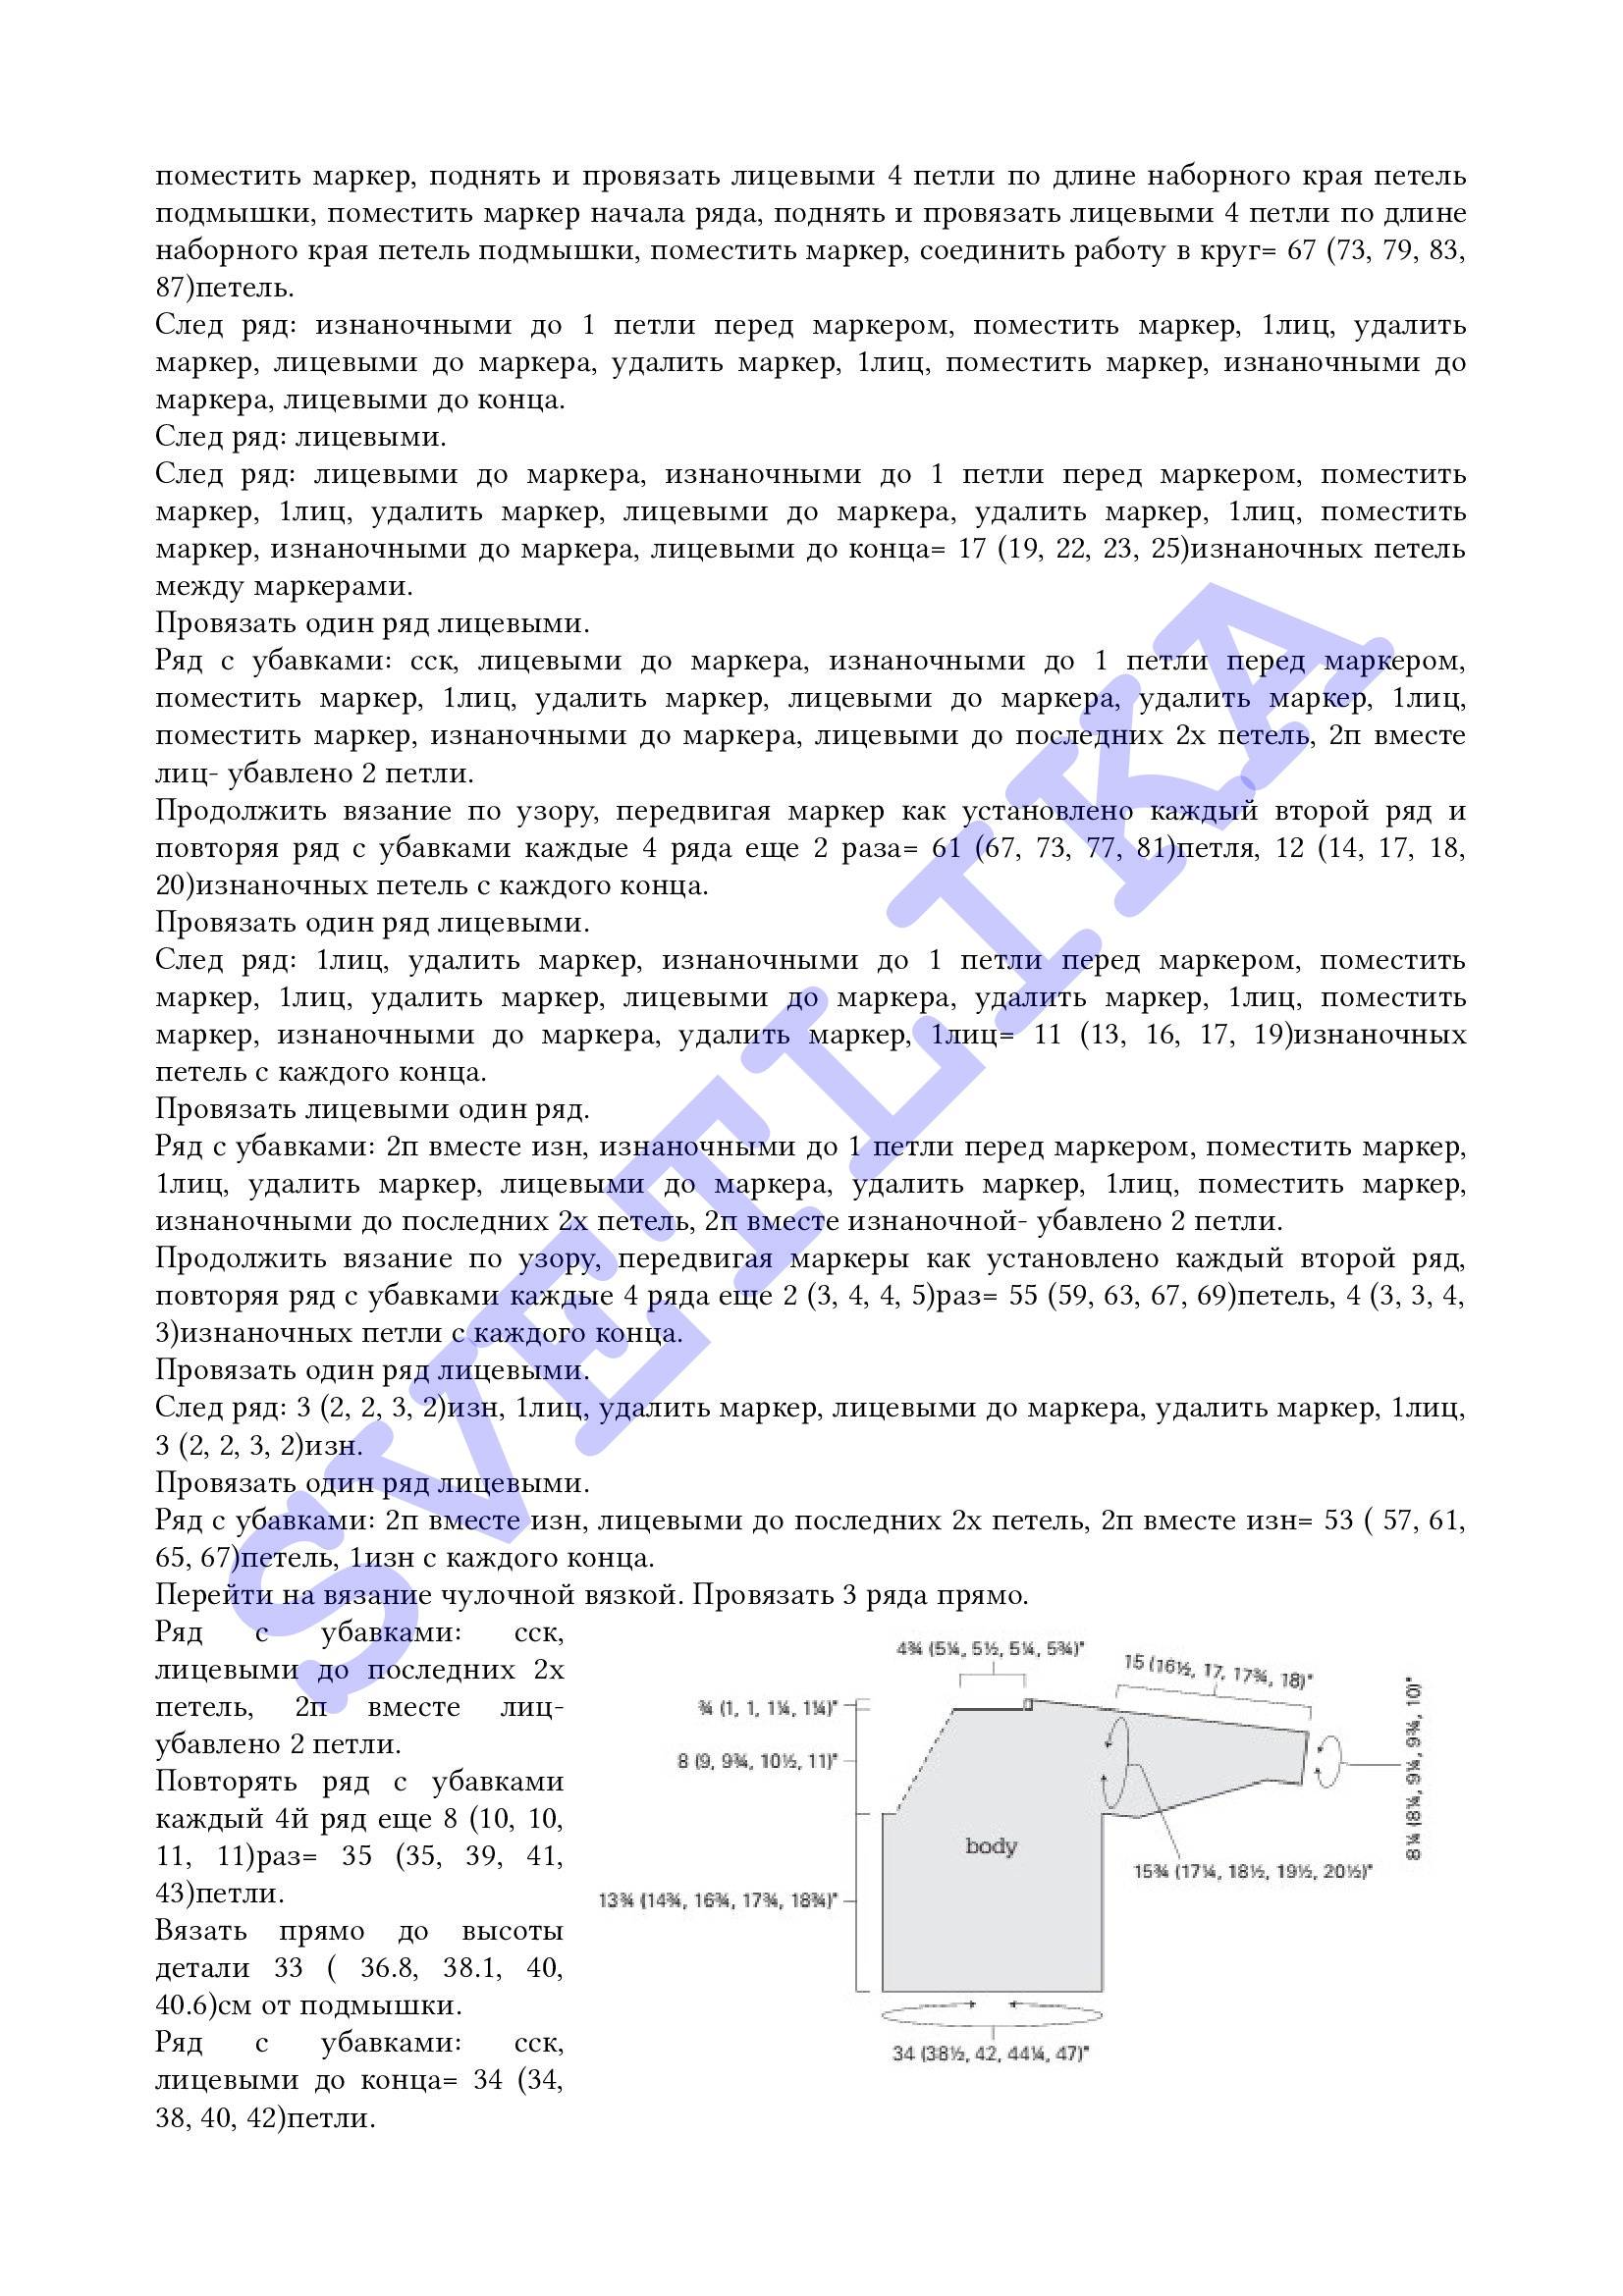 https://img-fotki.yandex.ru/get/16102/125862467.58/0_142d7c_f9a4f195_orig